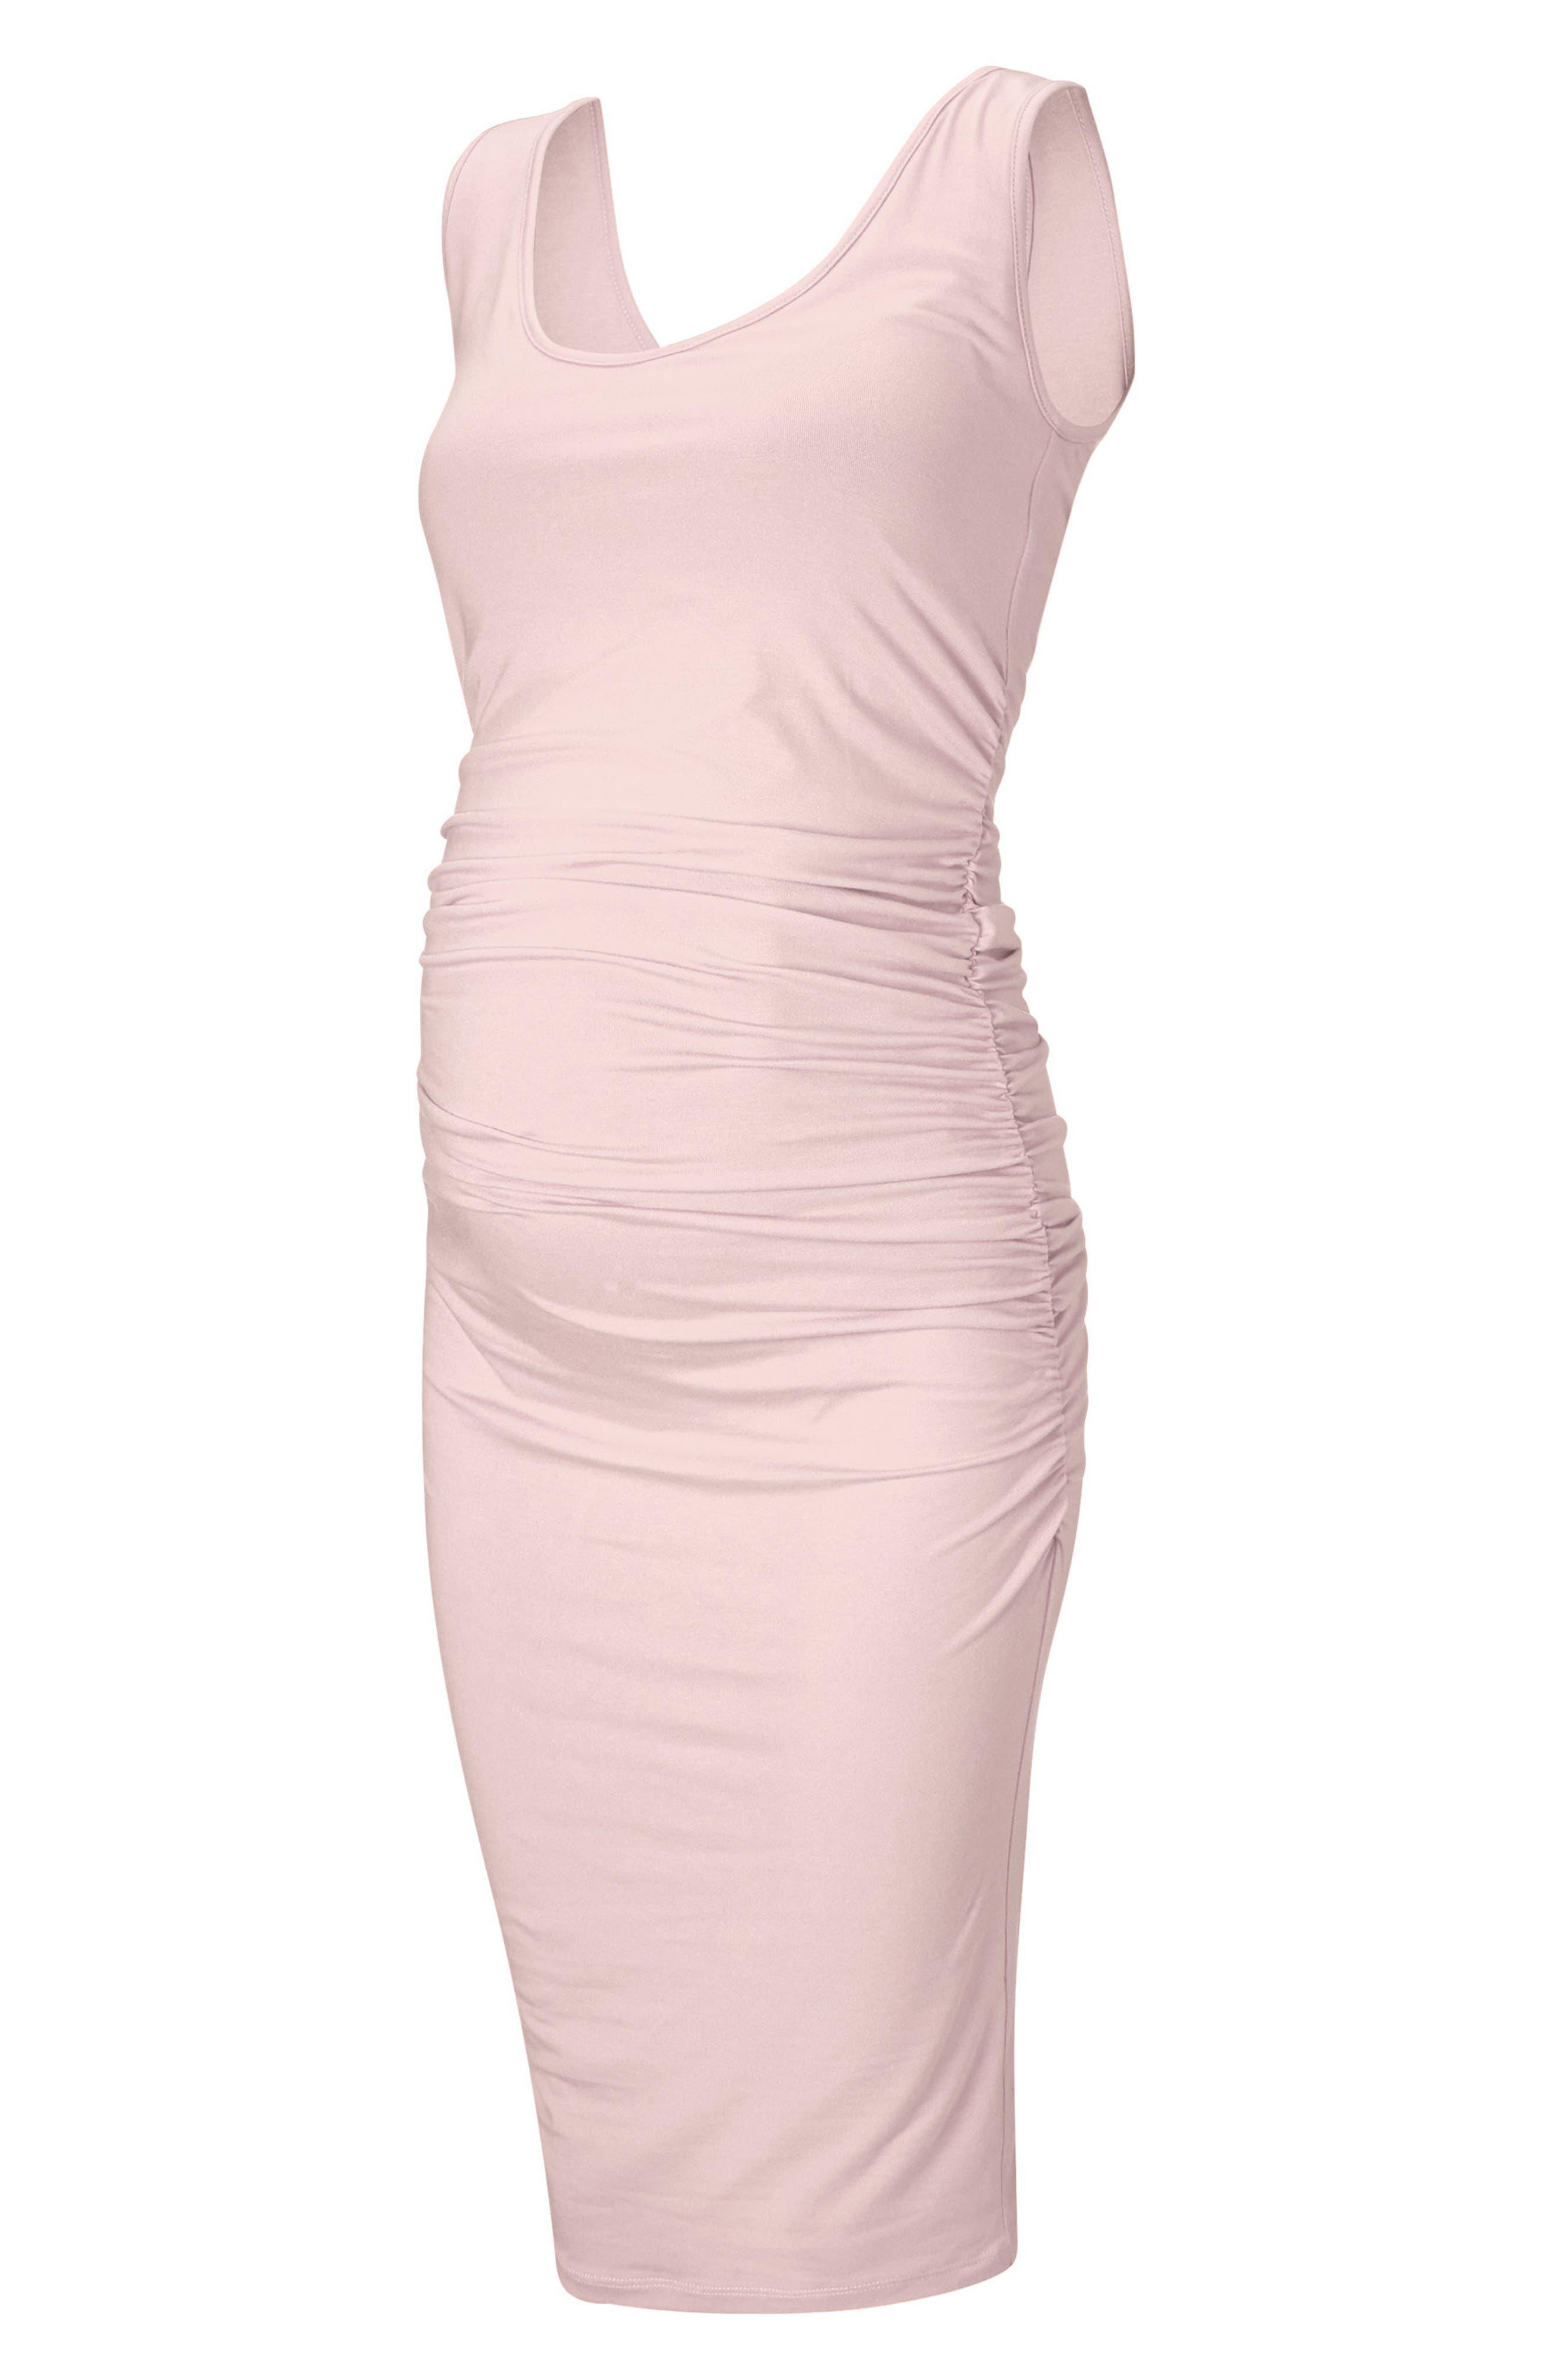 'Ellis' Side Ruched Maternity Tank Dress,                             Main thumbnail 1, color,                             Cloud Pink